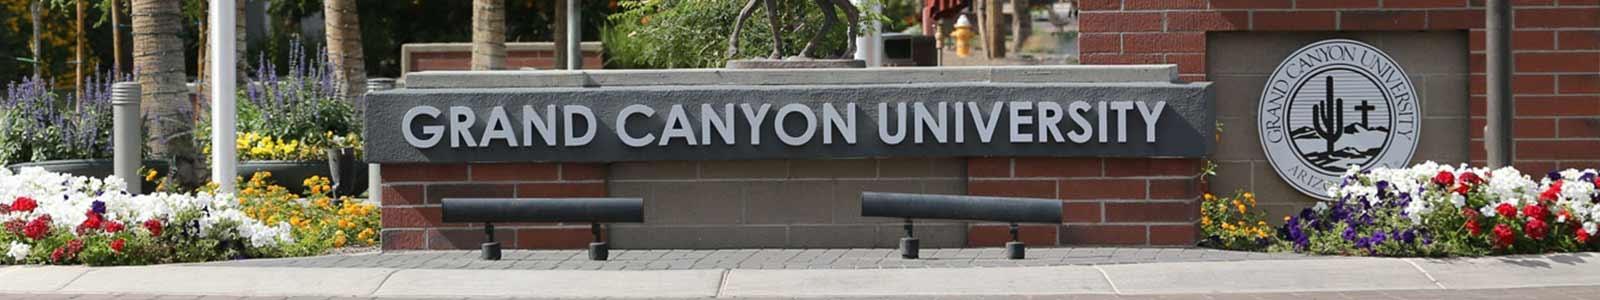 Academic Policies Accreditations Grand Canyon University